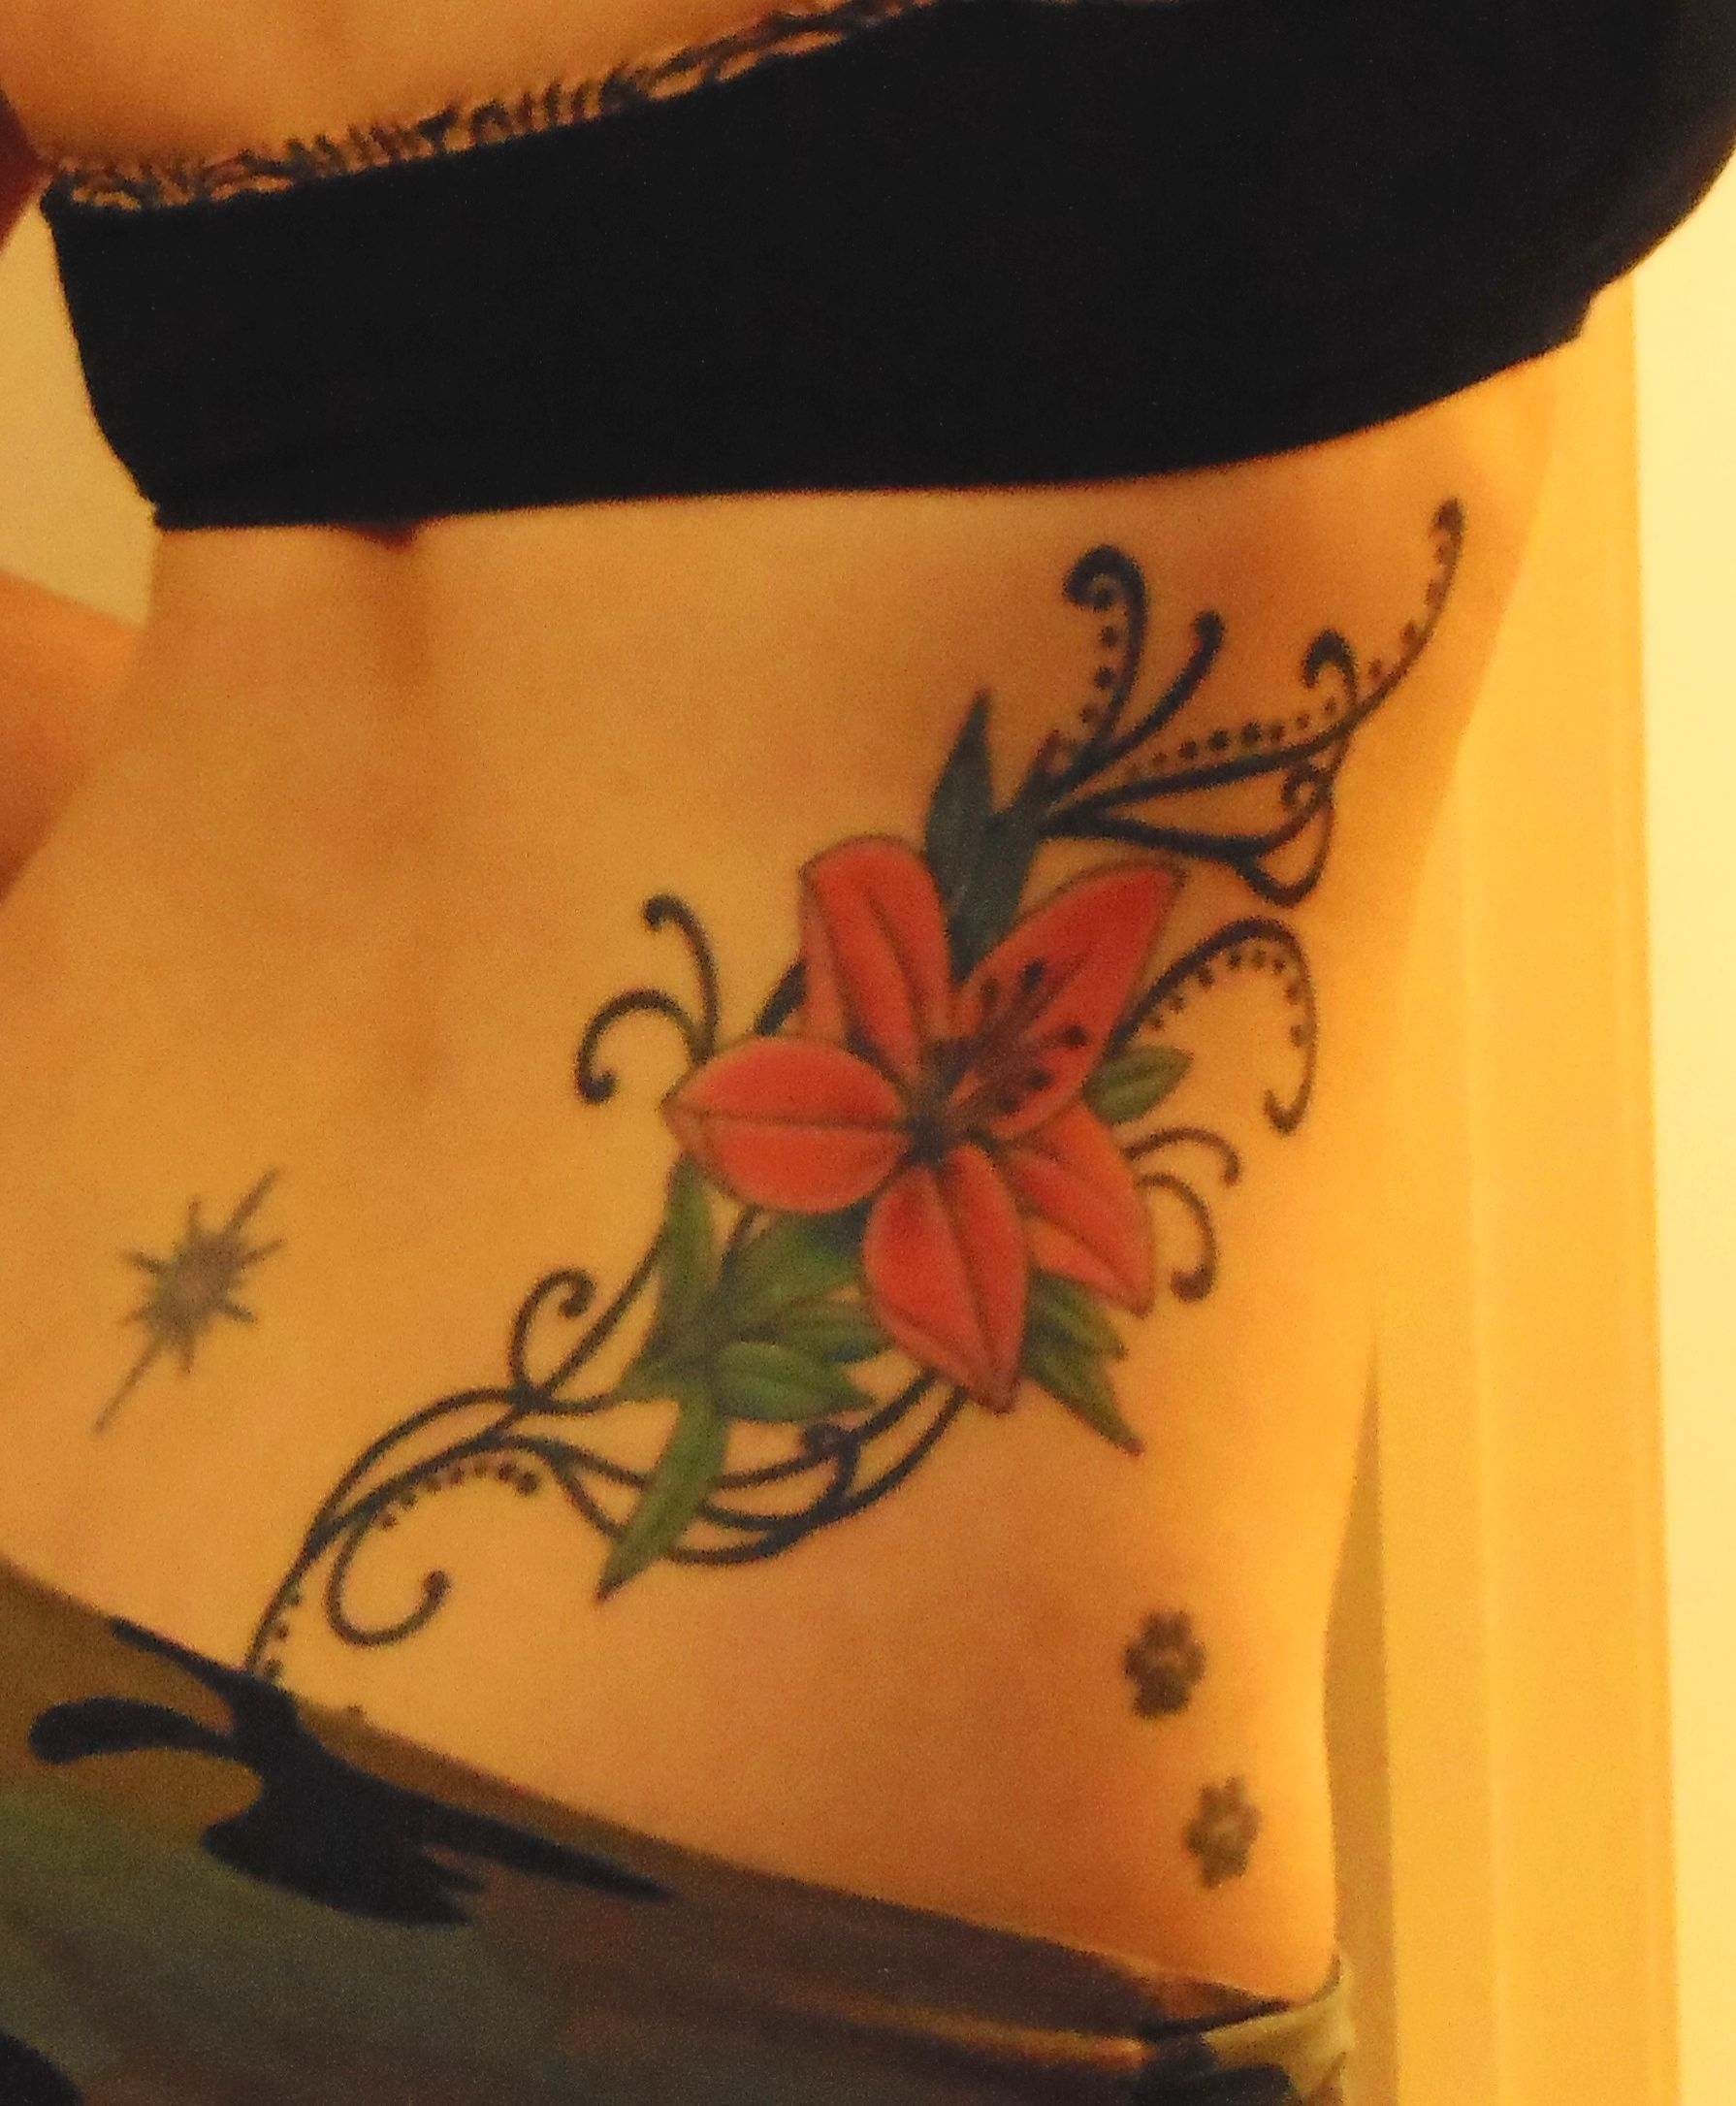 Paw Print Tattoos With Flowers: Lily Tattoo, Paw Print Tattoo, Starburst Tattoo, Hip